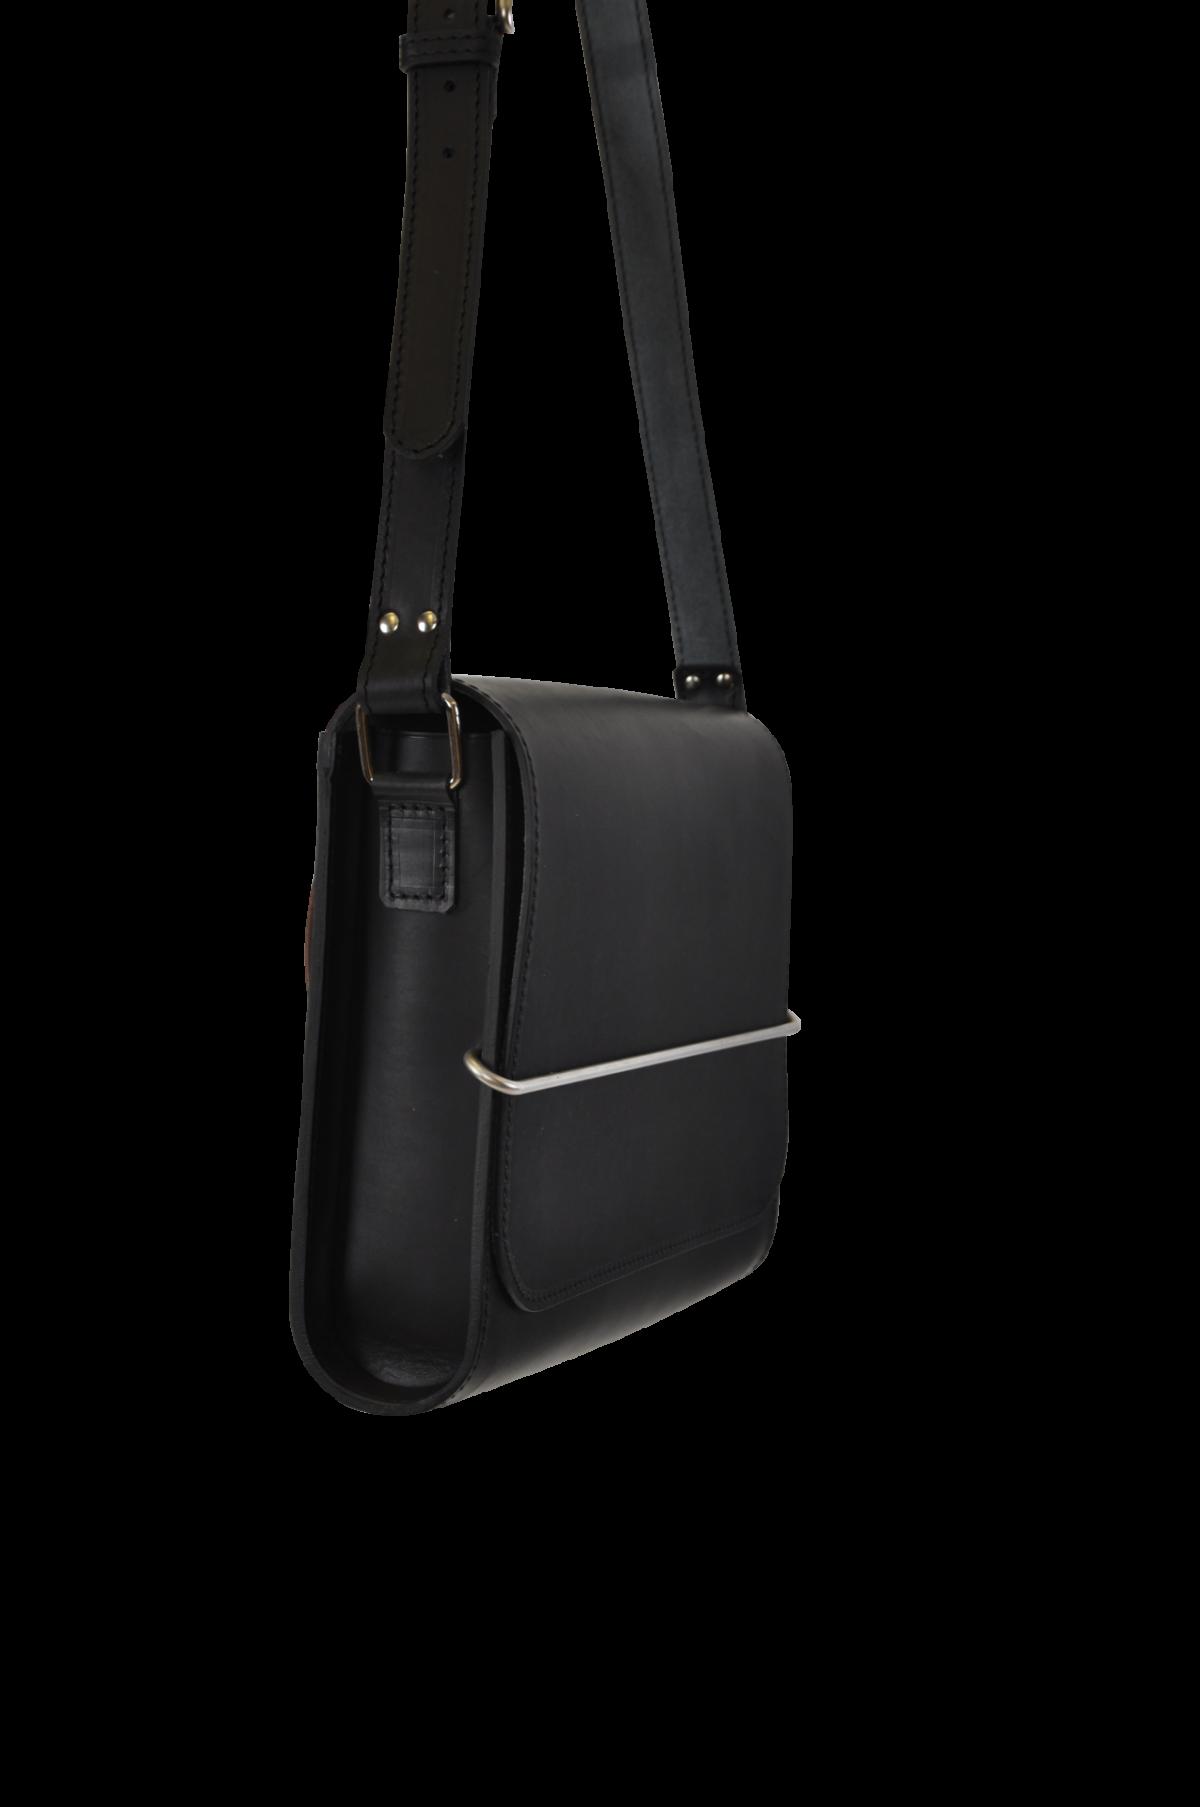 OX Bag black leather stainless steel buckle medium